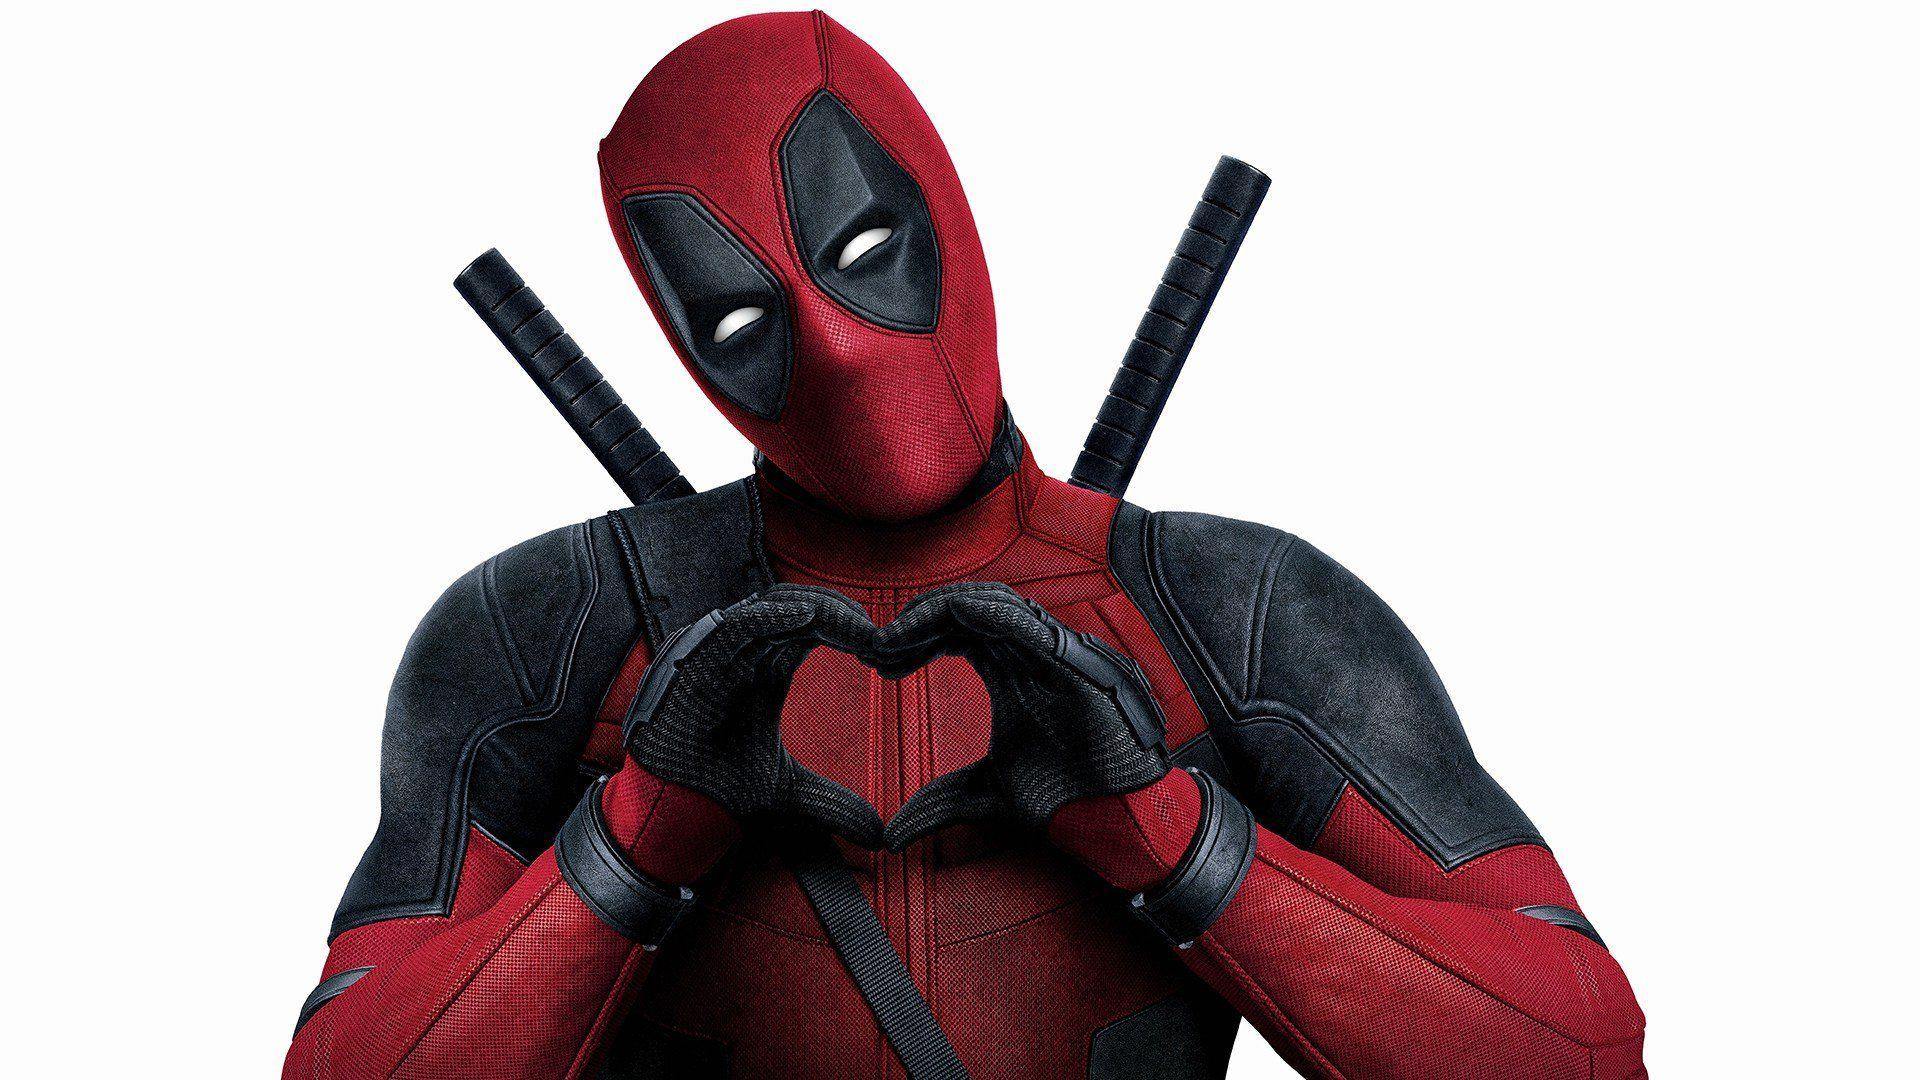 Deadpool Wallpaper Full Hd In 2020 Deadpool Quotes Deadpool Love Deadpool